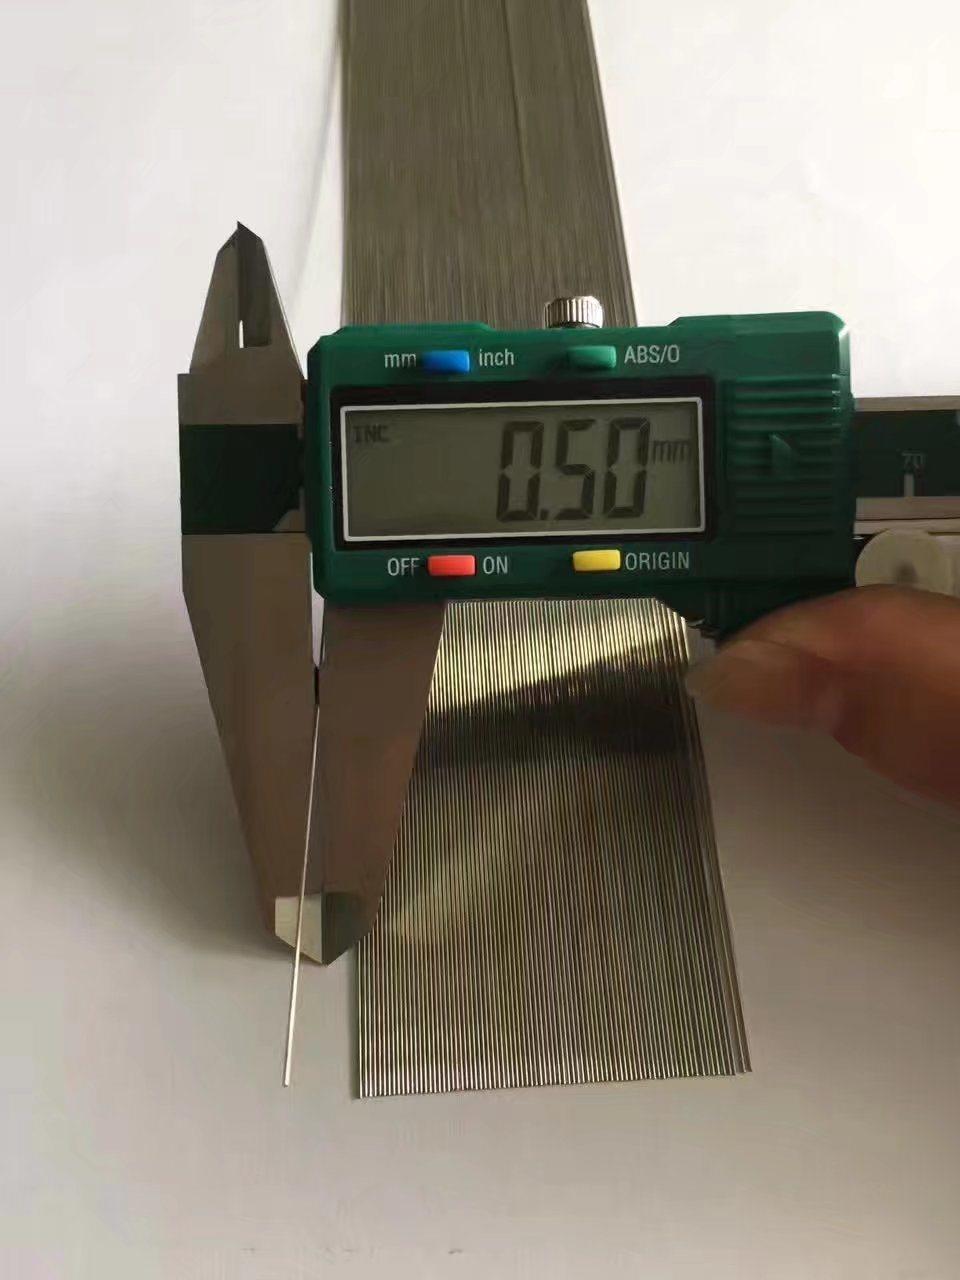 Ss 304 316 Stainless Steel Needle Medical Capillary Tube